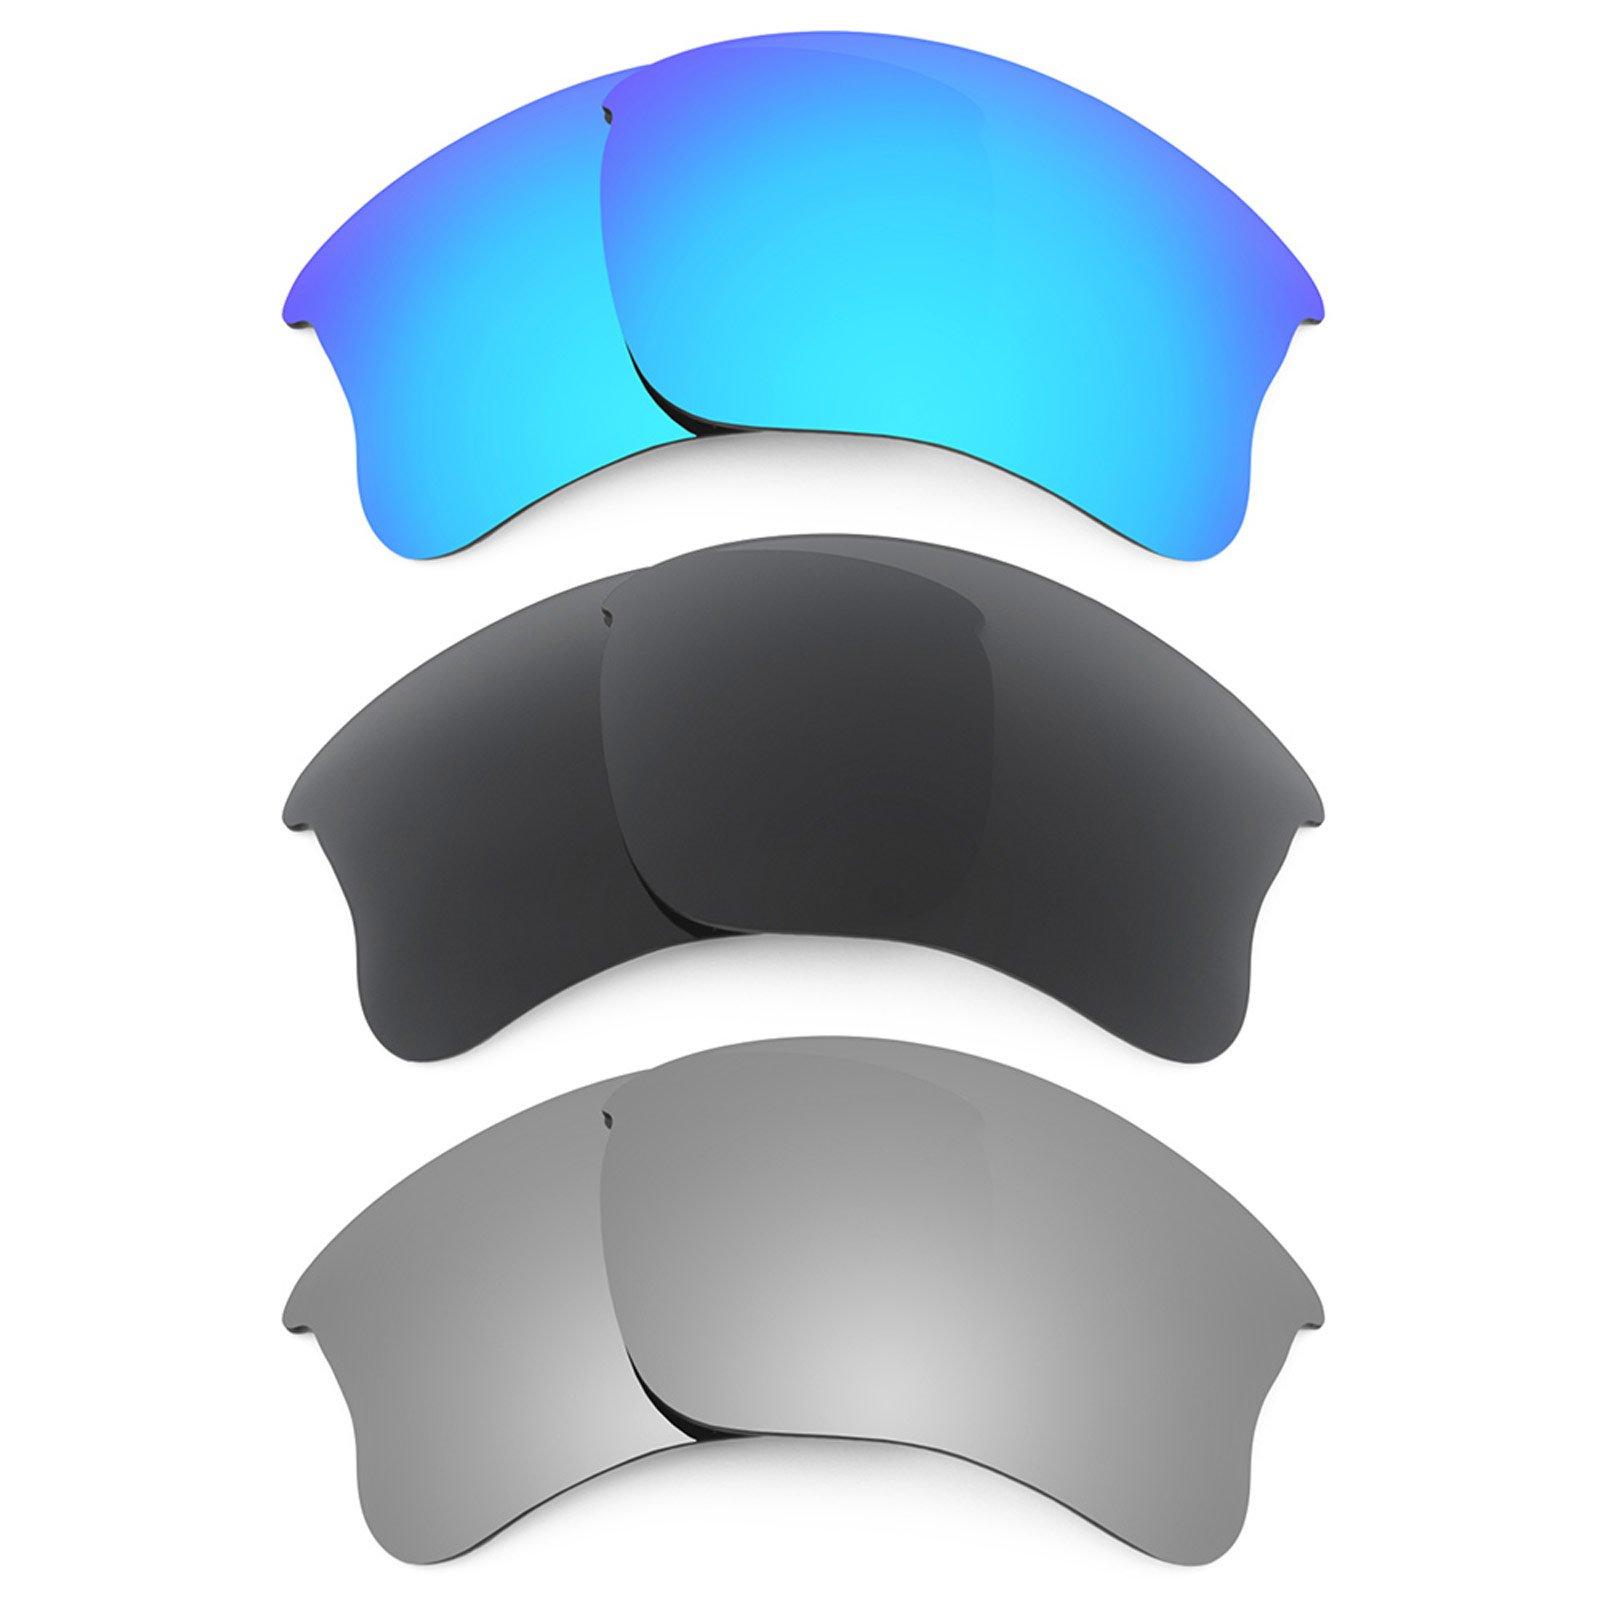 Revant Replacement Lenses for Oakley Flak Jacket XLJ 3 Pair Combo Pack K015 by Revant